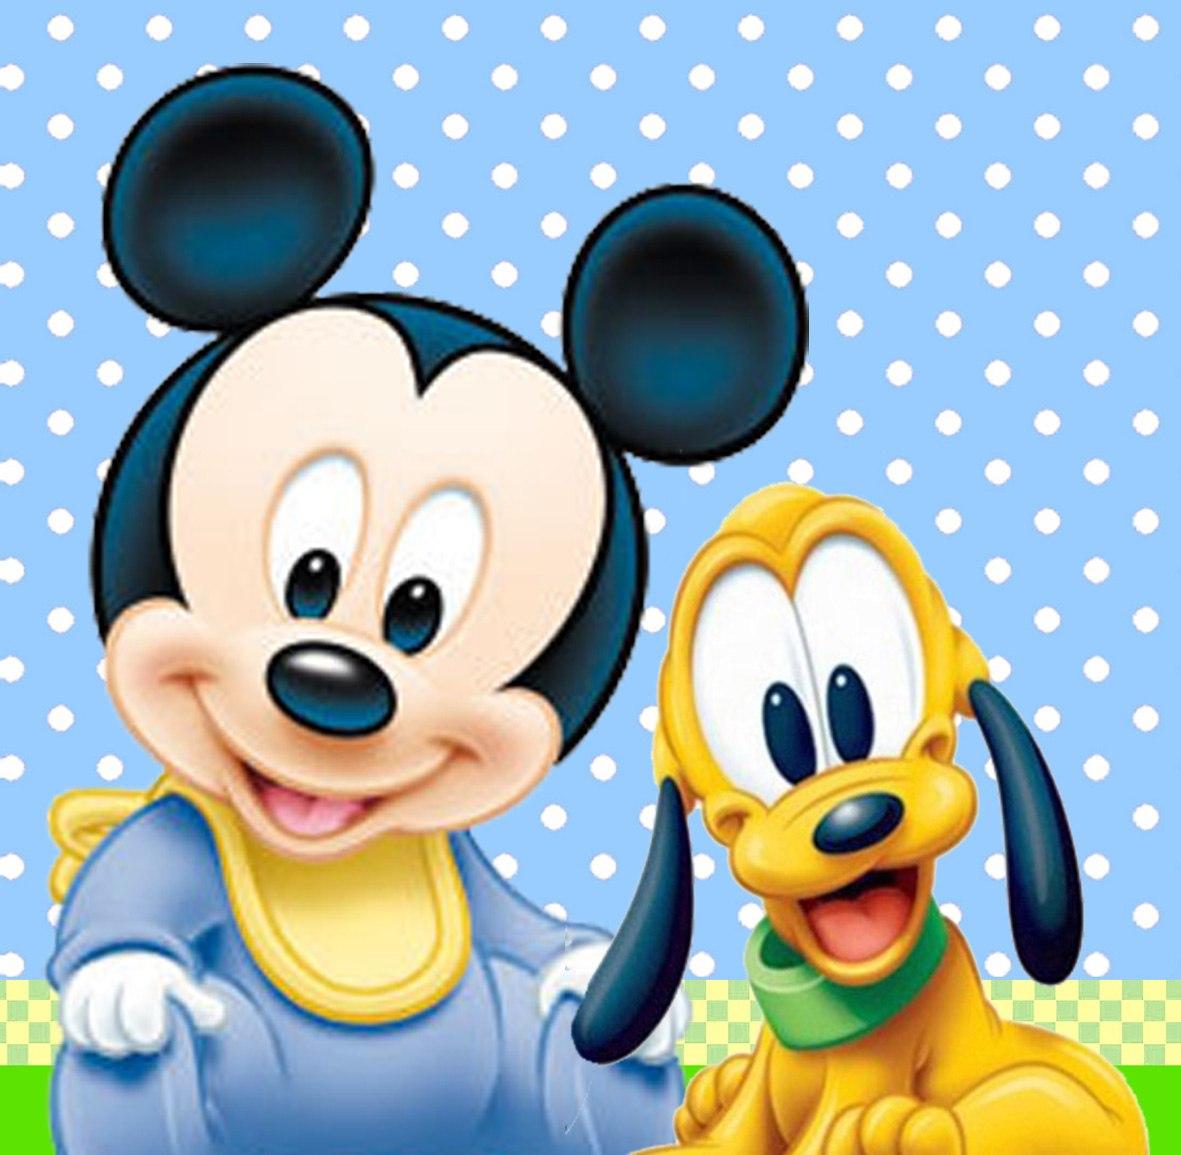 Disney Mickey Mouse bebé - Imagui